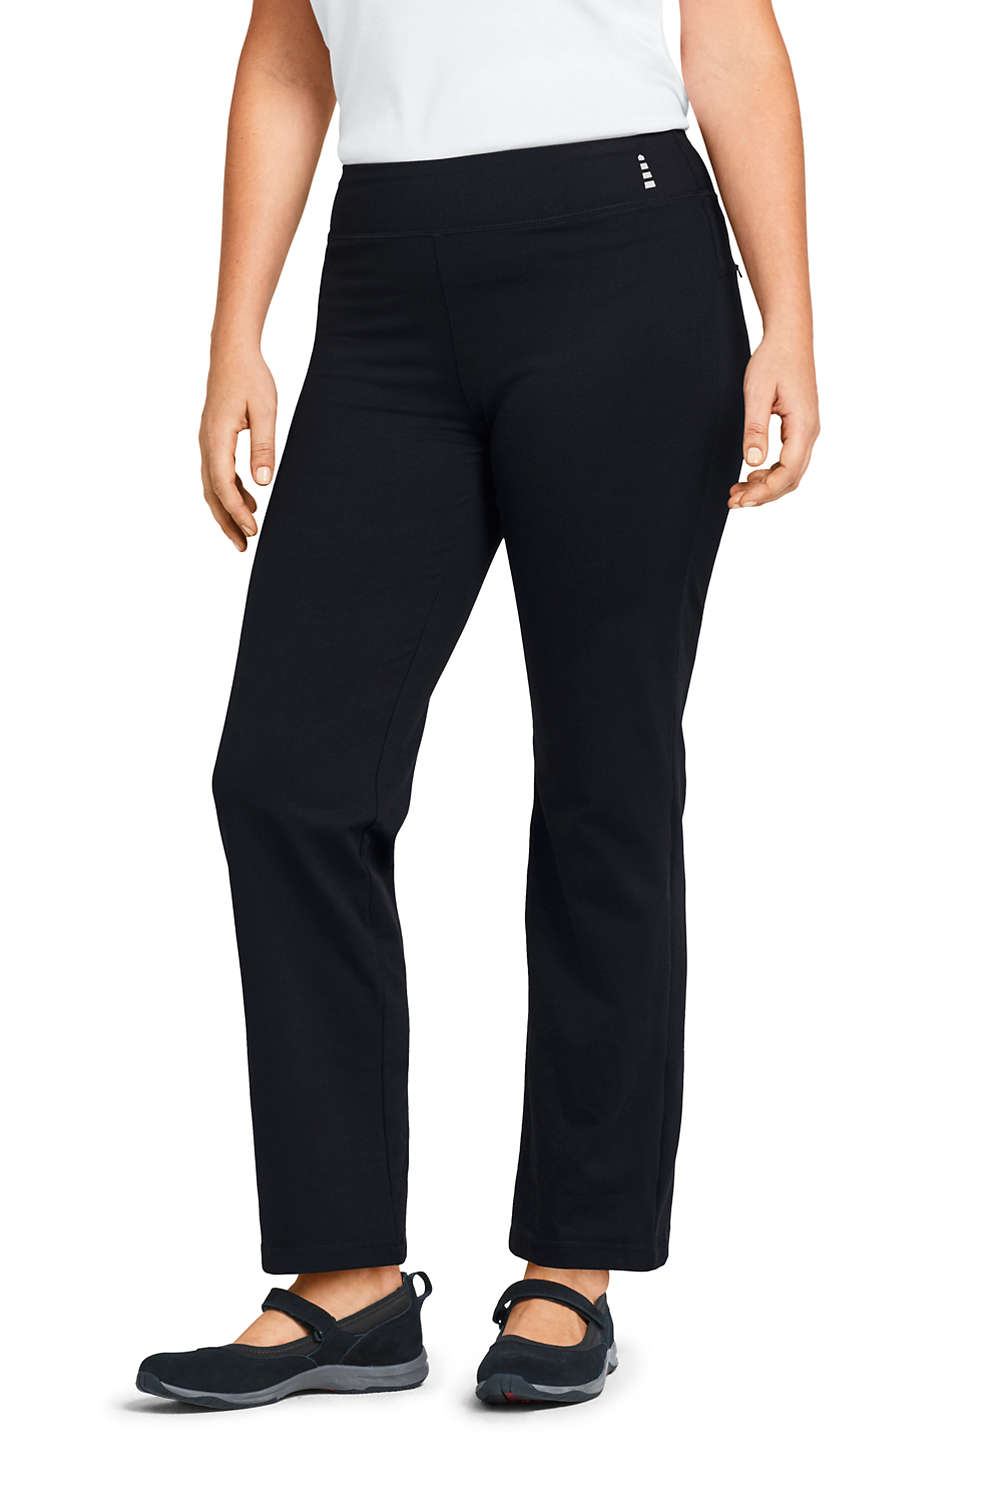 d696f4ebf2654 Women's Plus Size Active Yoga Pants from Lands' End